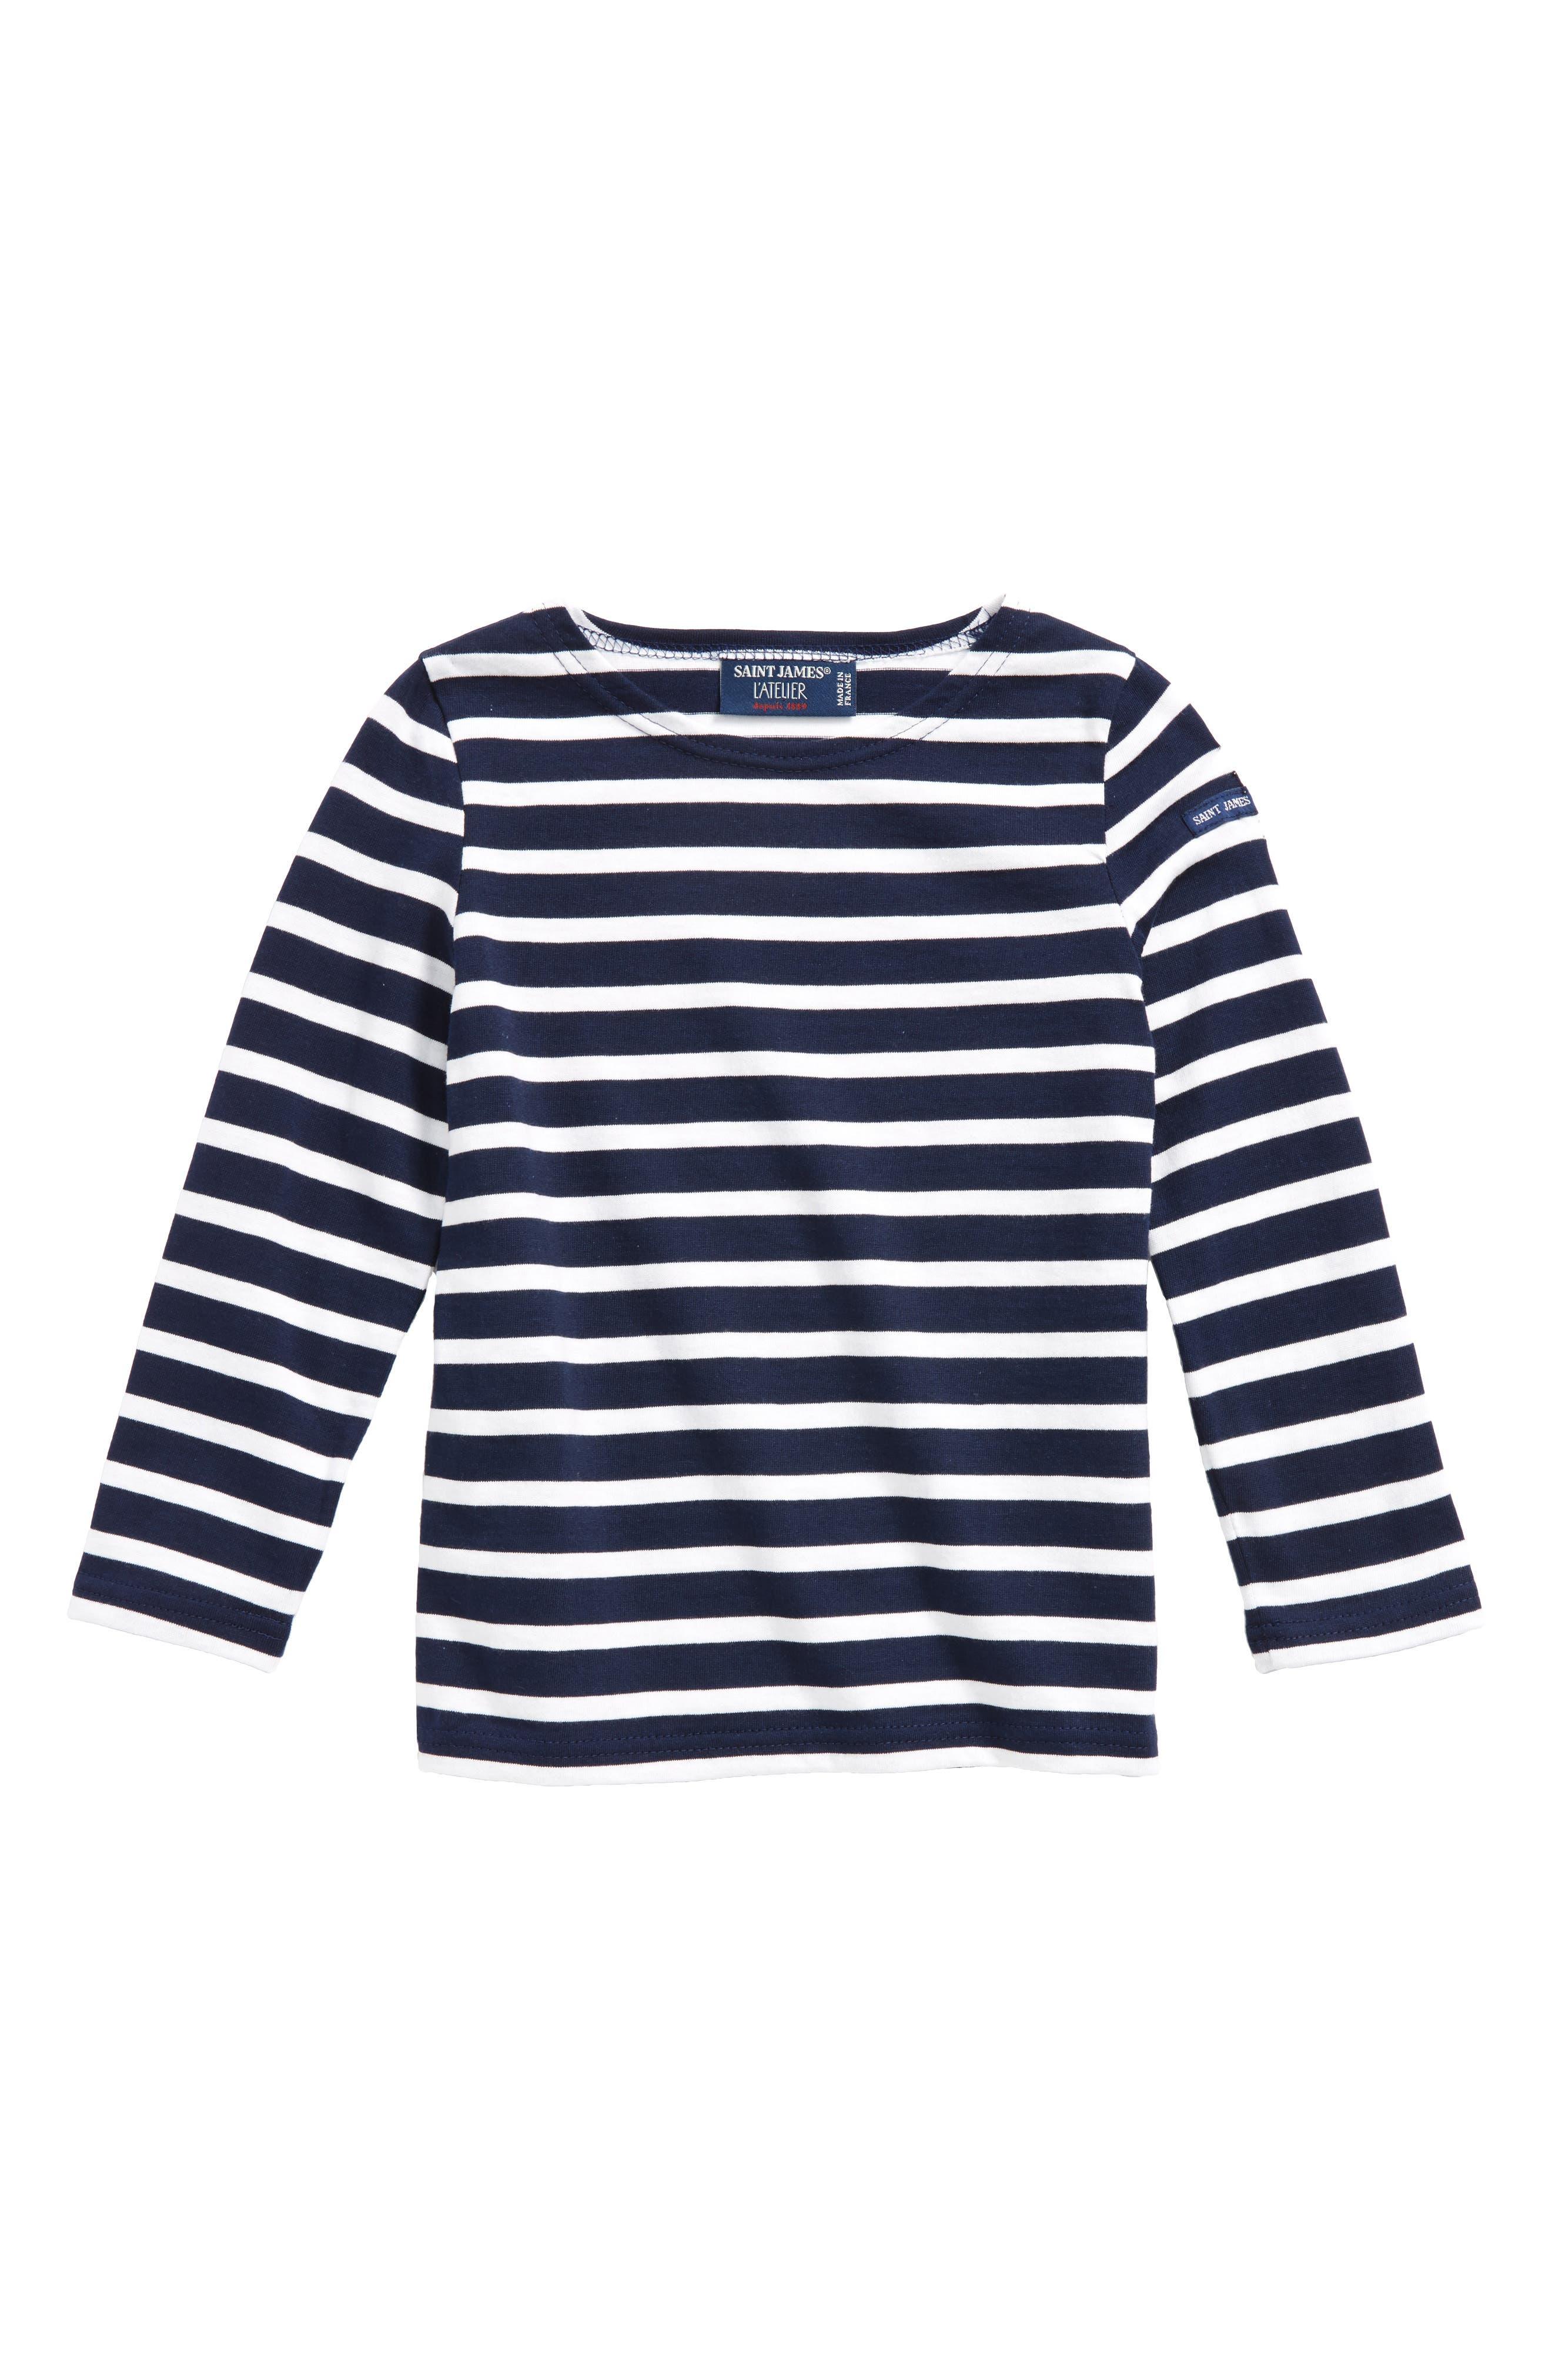 Minquiers Striped Sailor Shirt,                         Main,                         color, Navy/ White